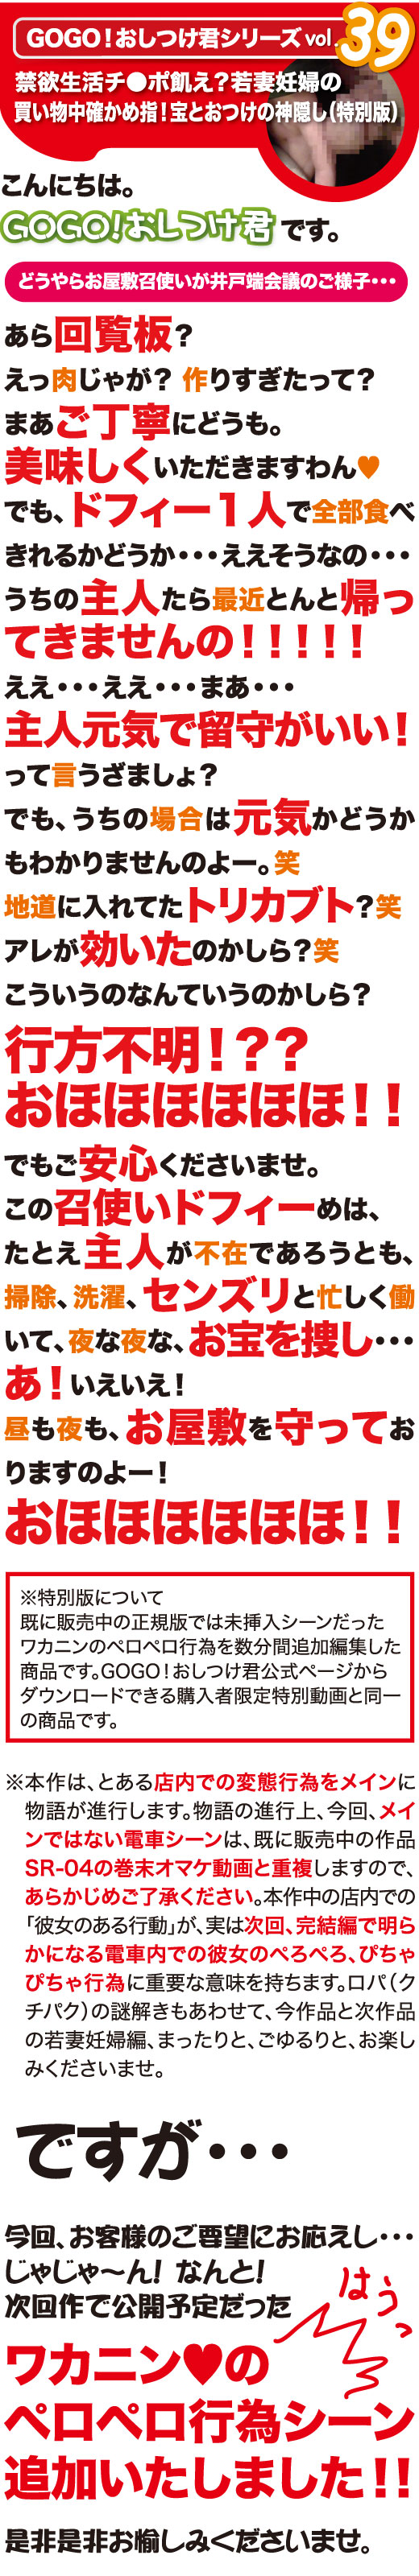 OST_0039new_C01_FC2.jpg